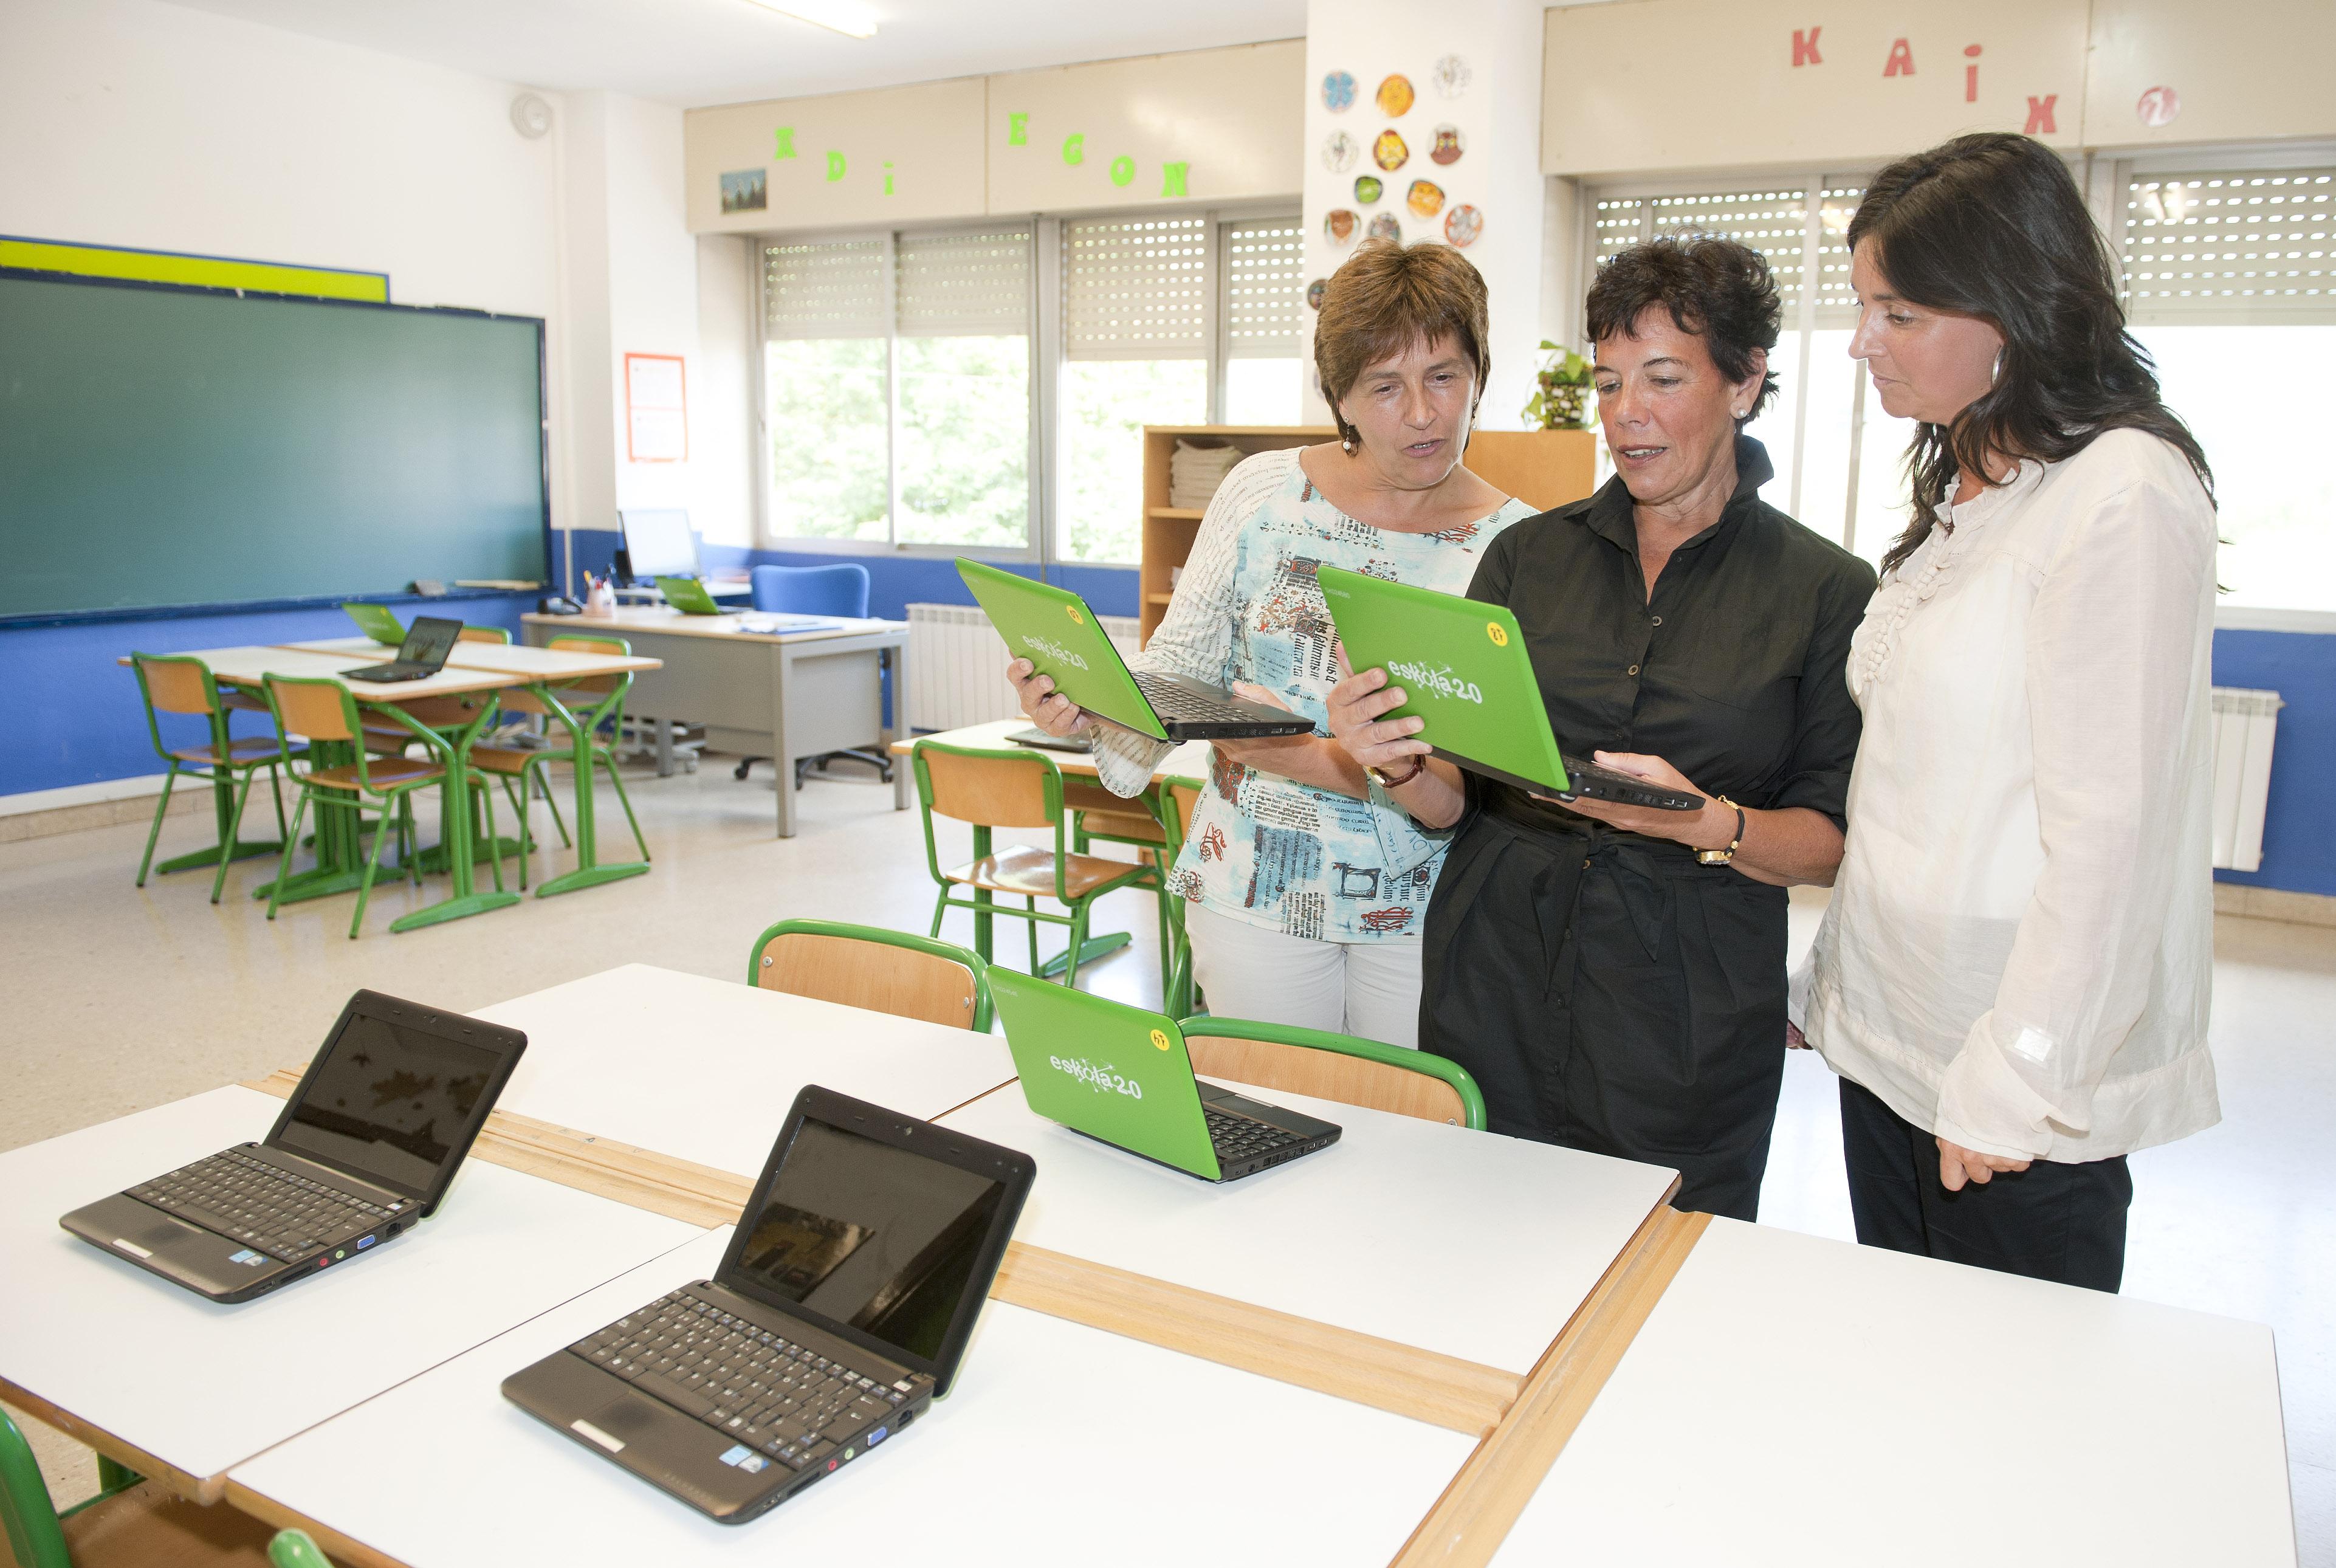 2011_09_02_educacion_nuevo_curso_san_martin_aula_ordenadores.jpg